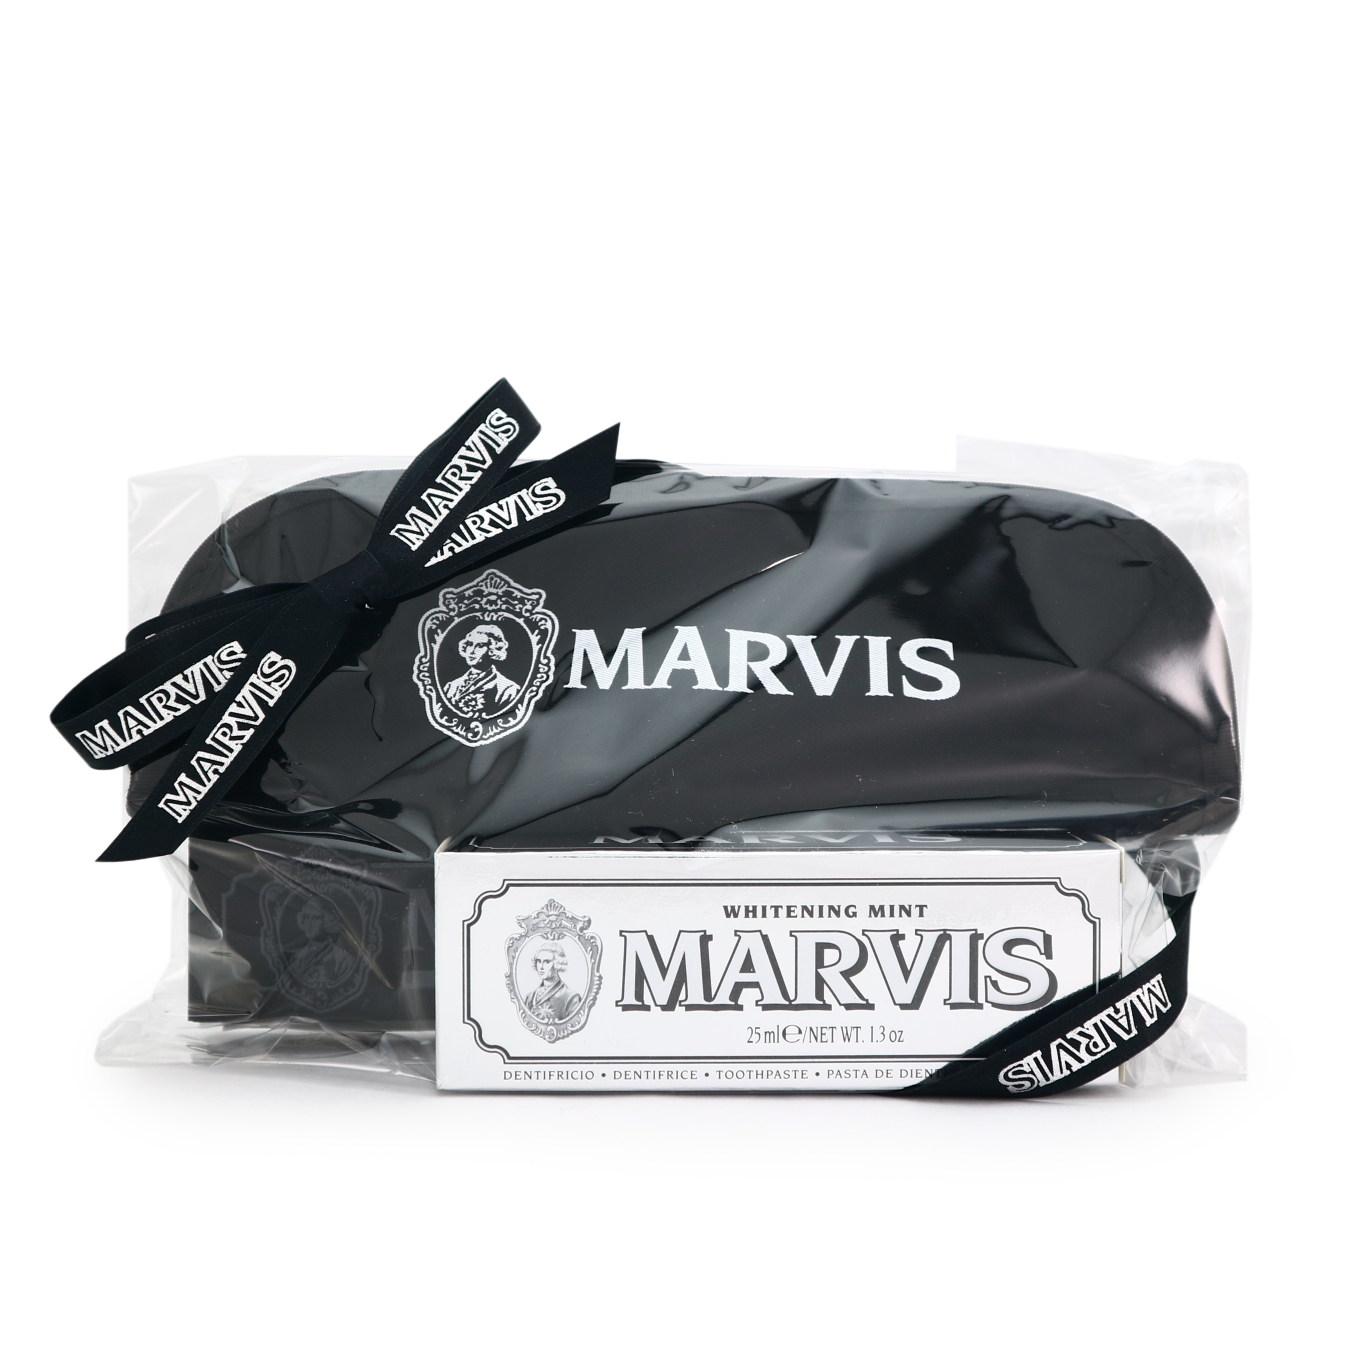 TRAVEL SET BK/MARVIS(トラベルセット)